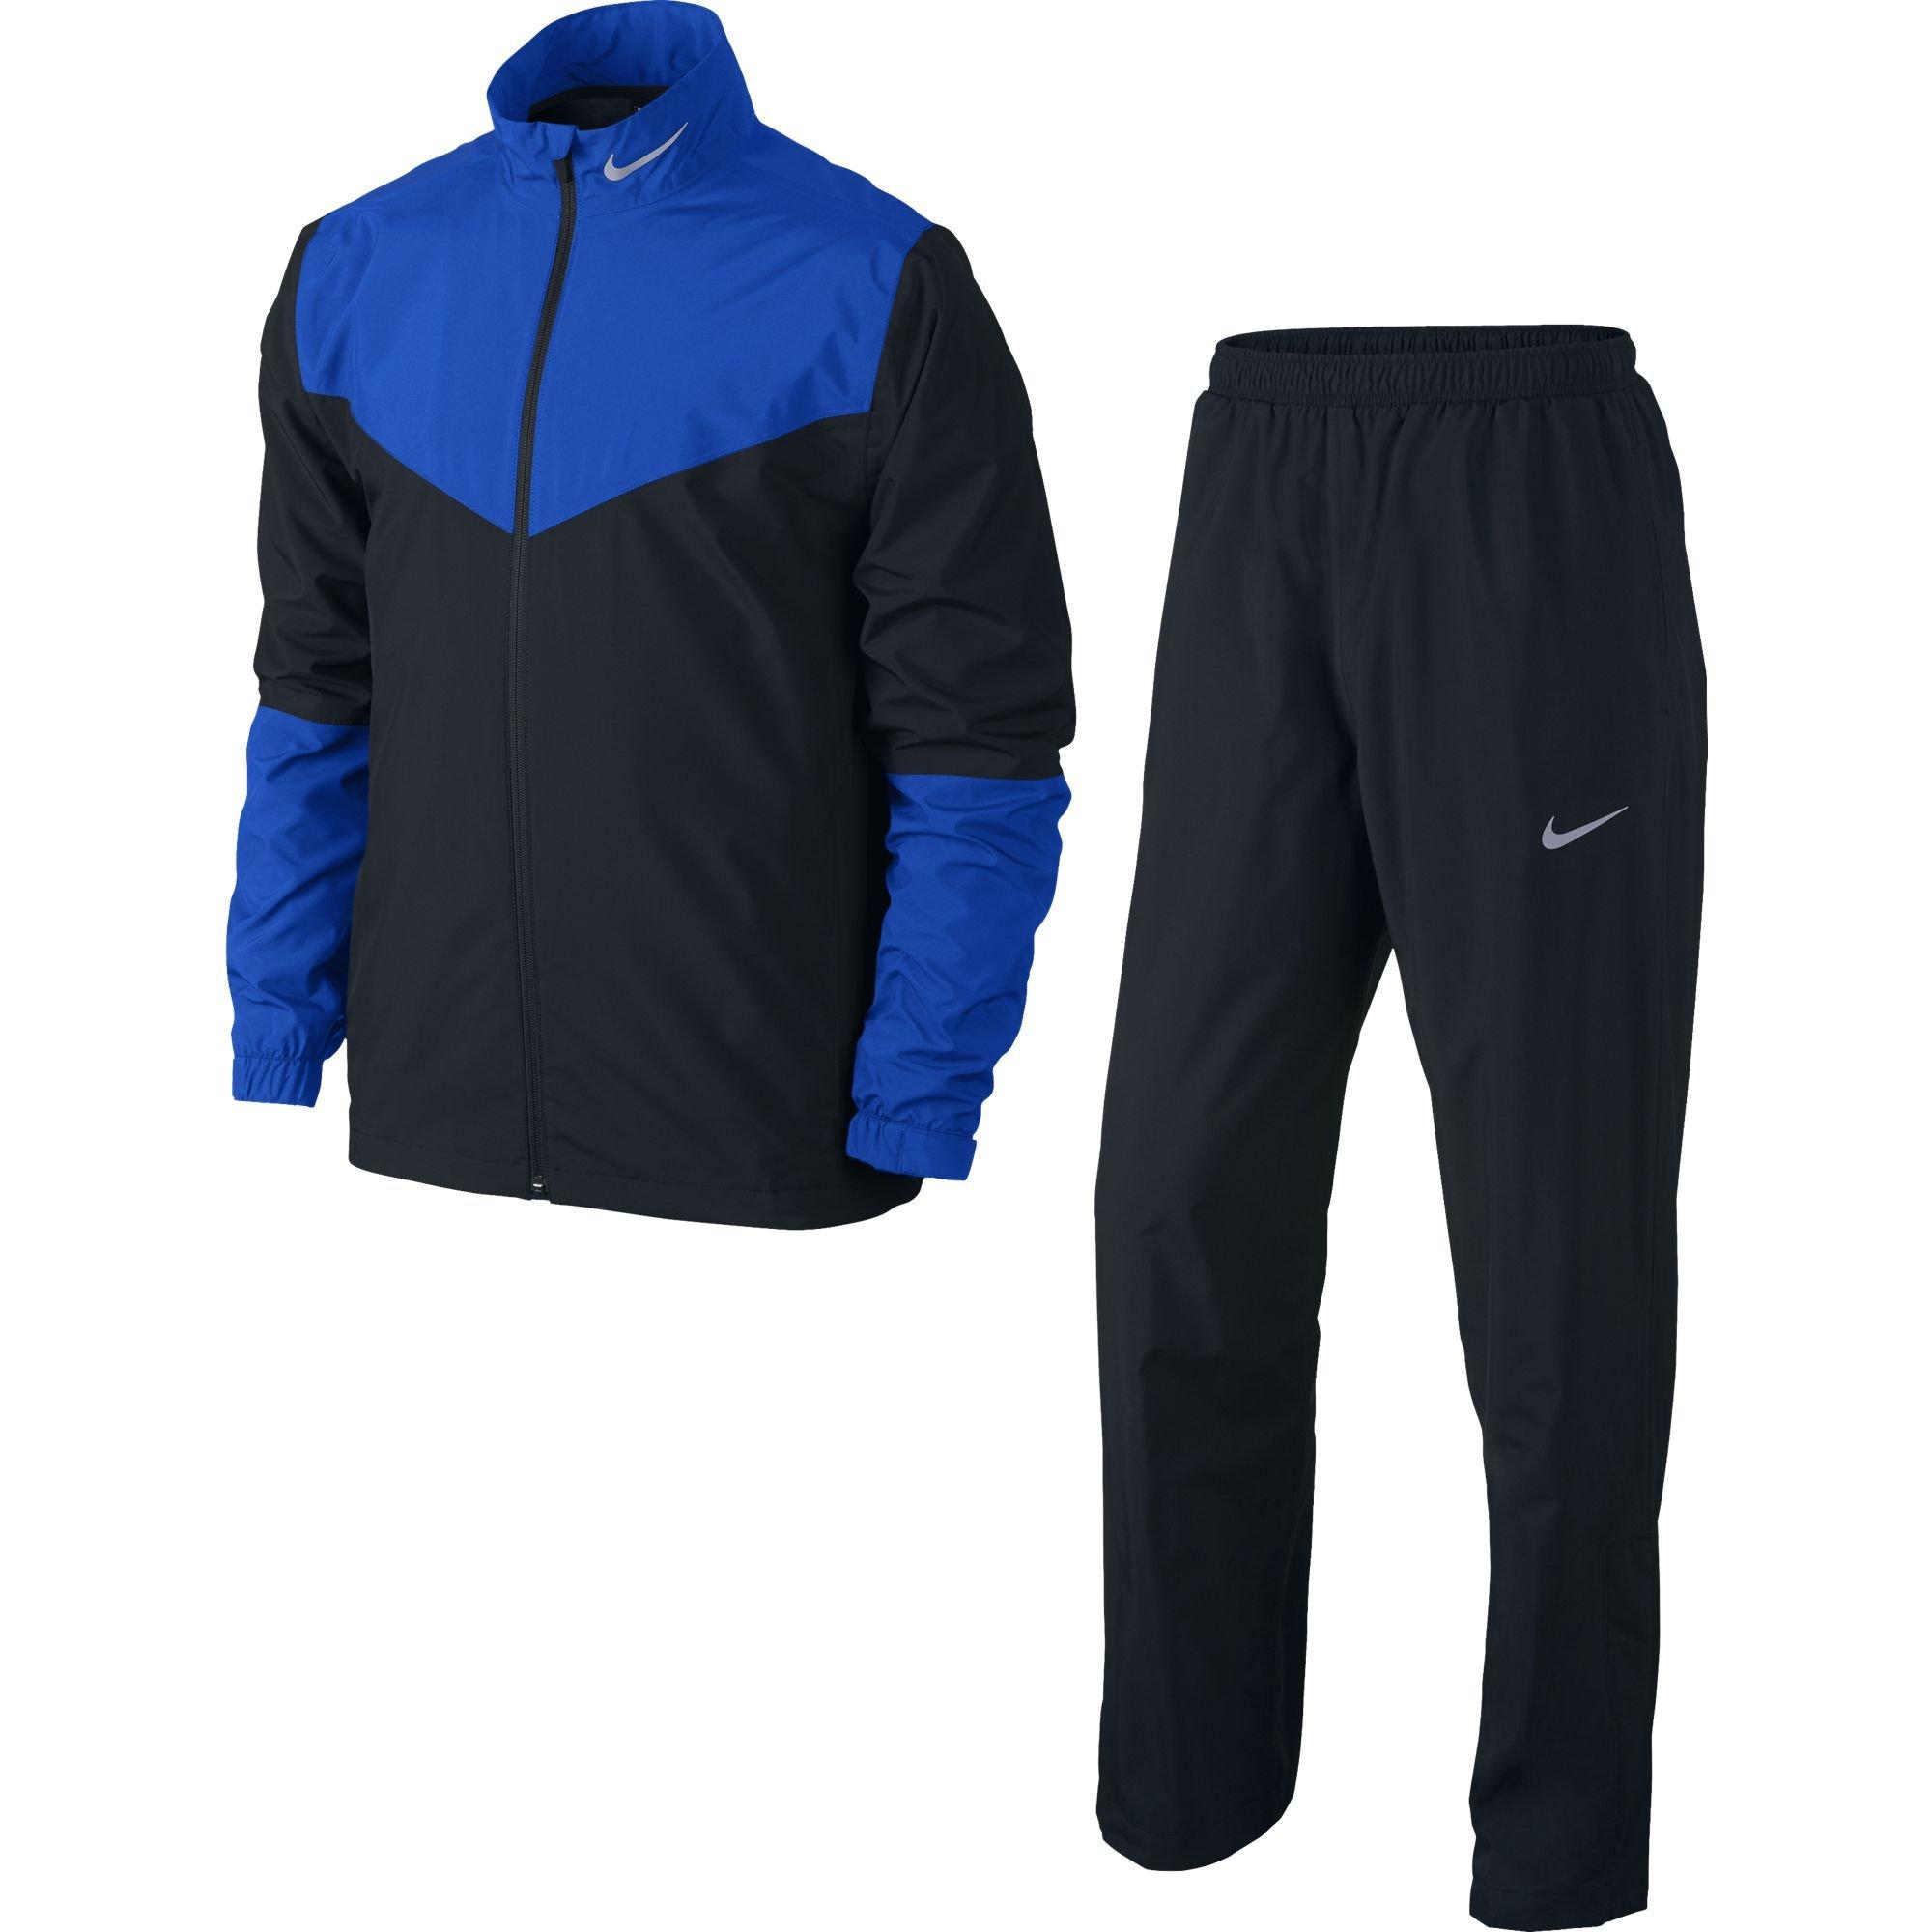 Nike Golf Storm-FIT Rainsuit (Black/Hyper Cobalt/Reflective Silver, X-Large) by Nike (Image #1)